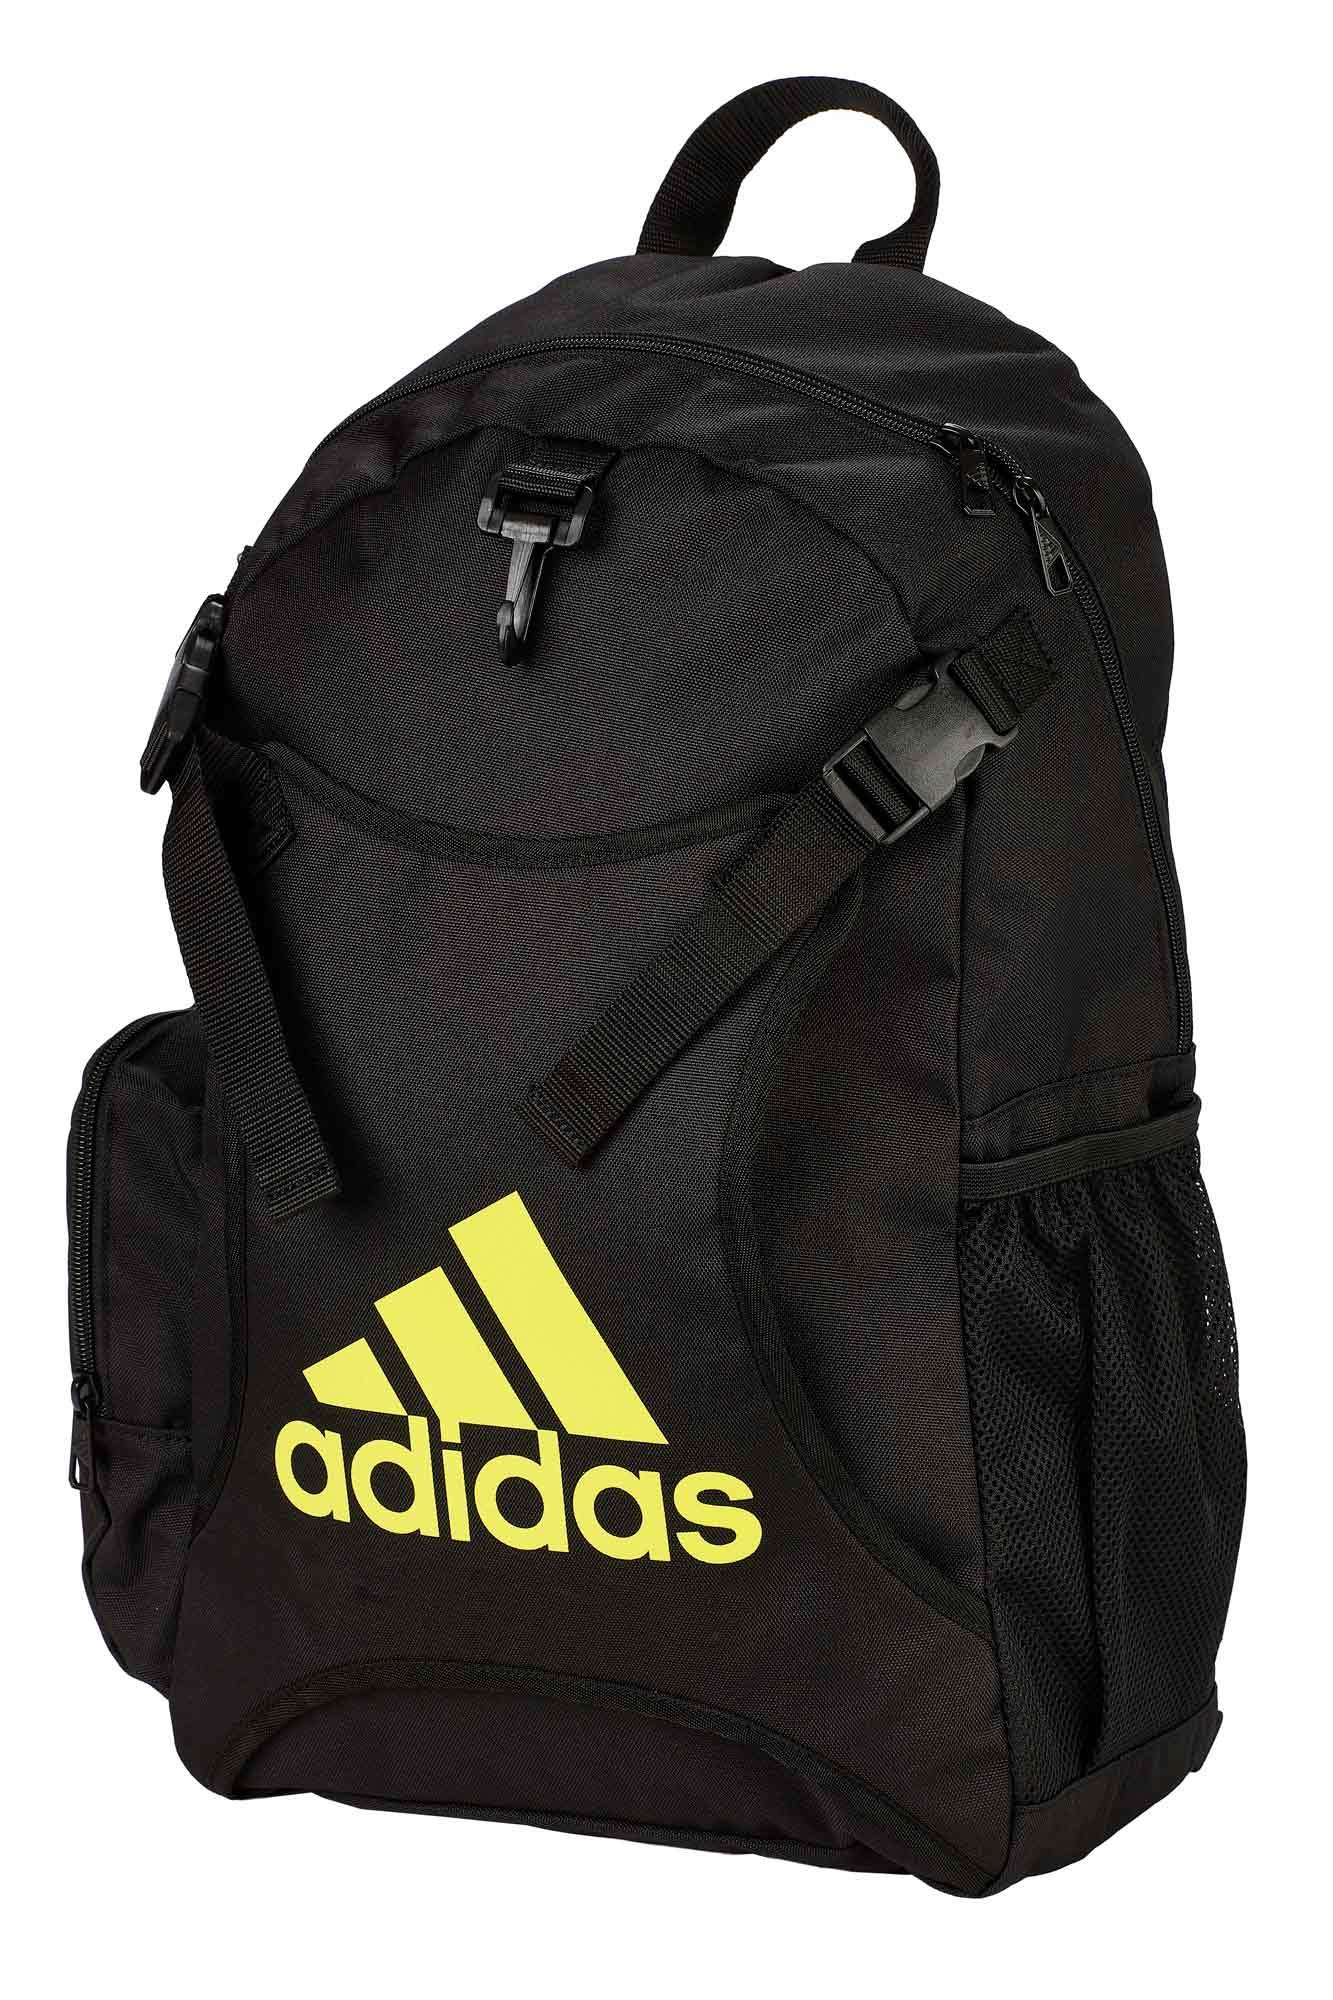 good texture footwear new cheap adidas backpack Taekwondo with body guard holder ADIACC096 black/schock  yellow